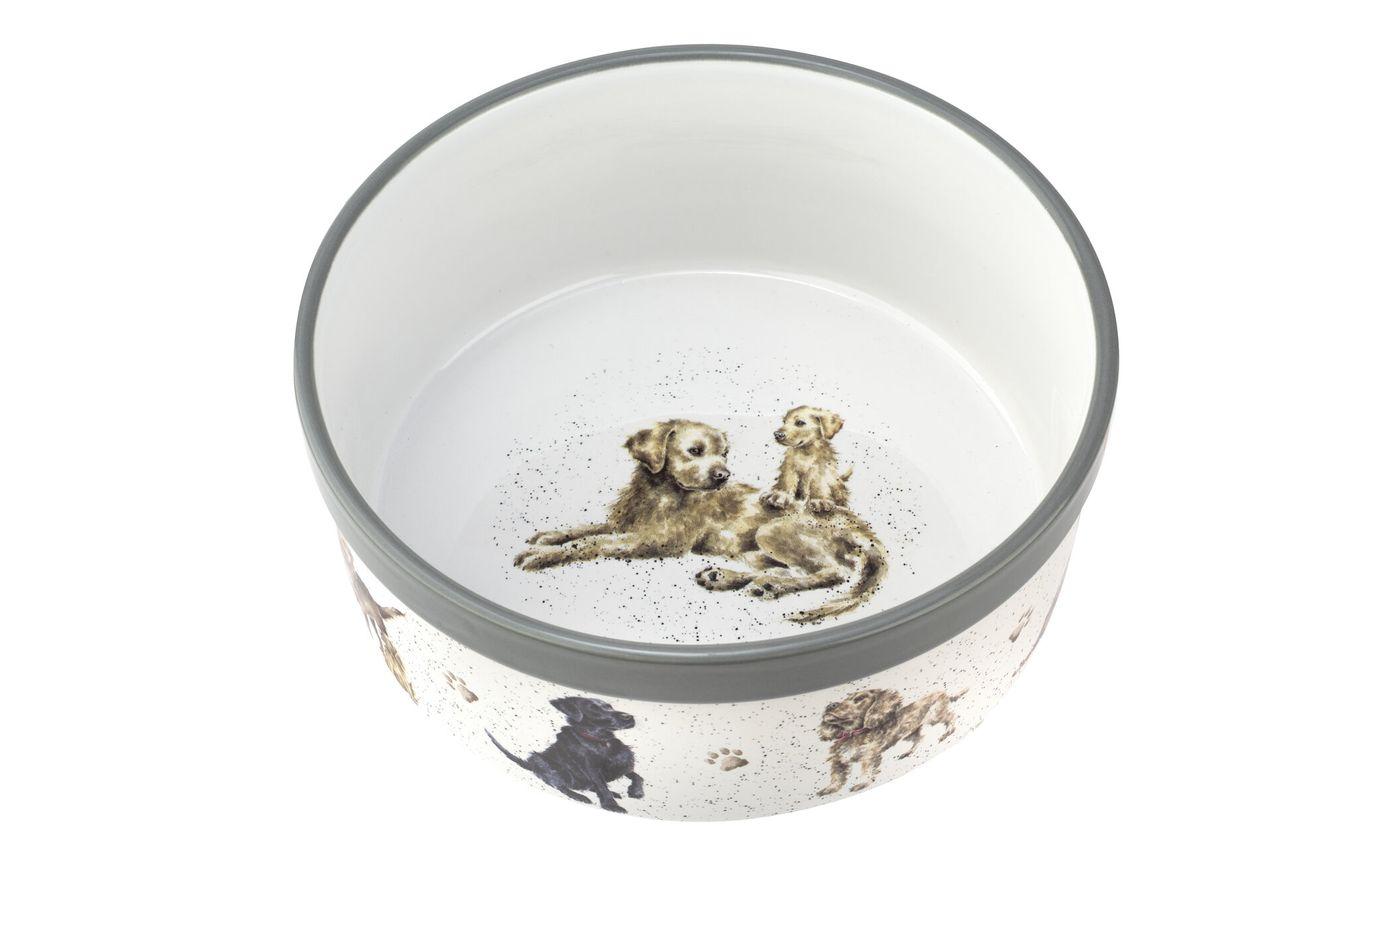 Royal Worcester Wrendale Designs Pet Bowl 20cm thumb 1